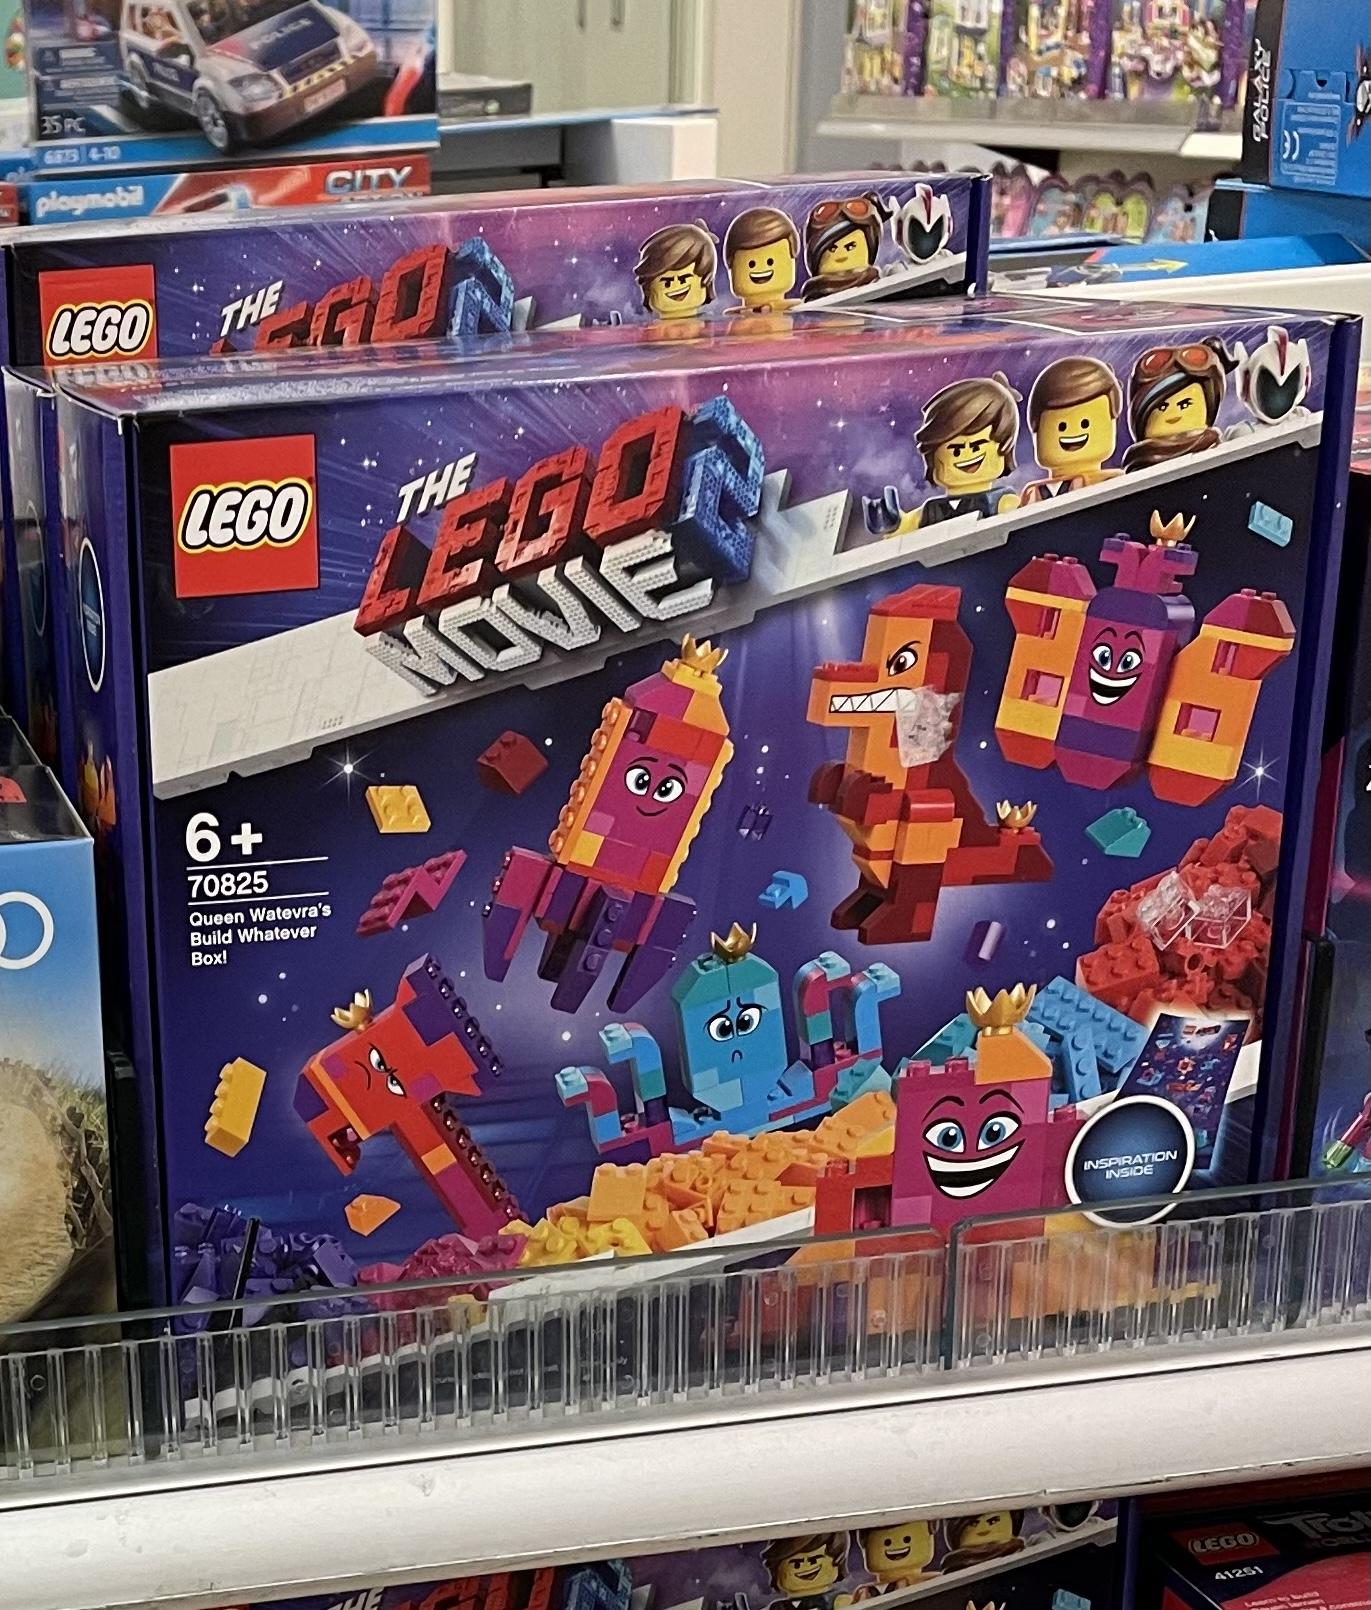 GALERIA Filialen: LEGO Königin Wasimma Si-Willis Bau-was-du-willst-Box! (70825)